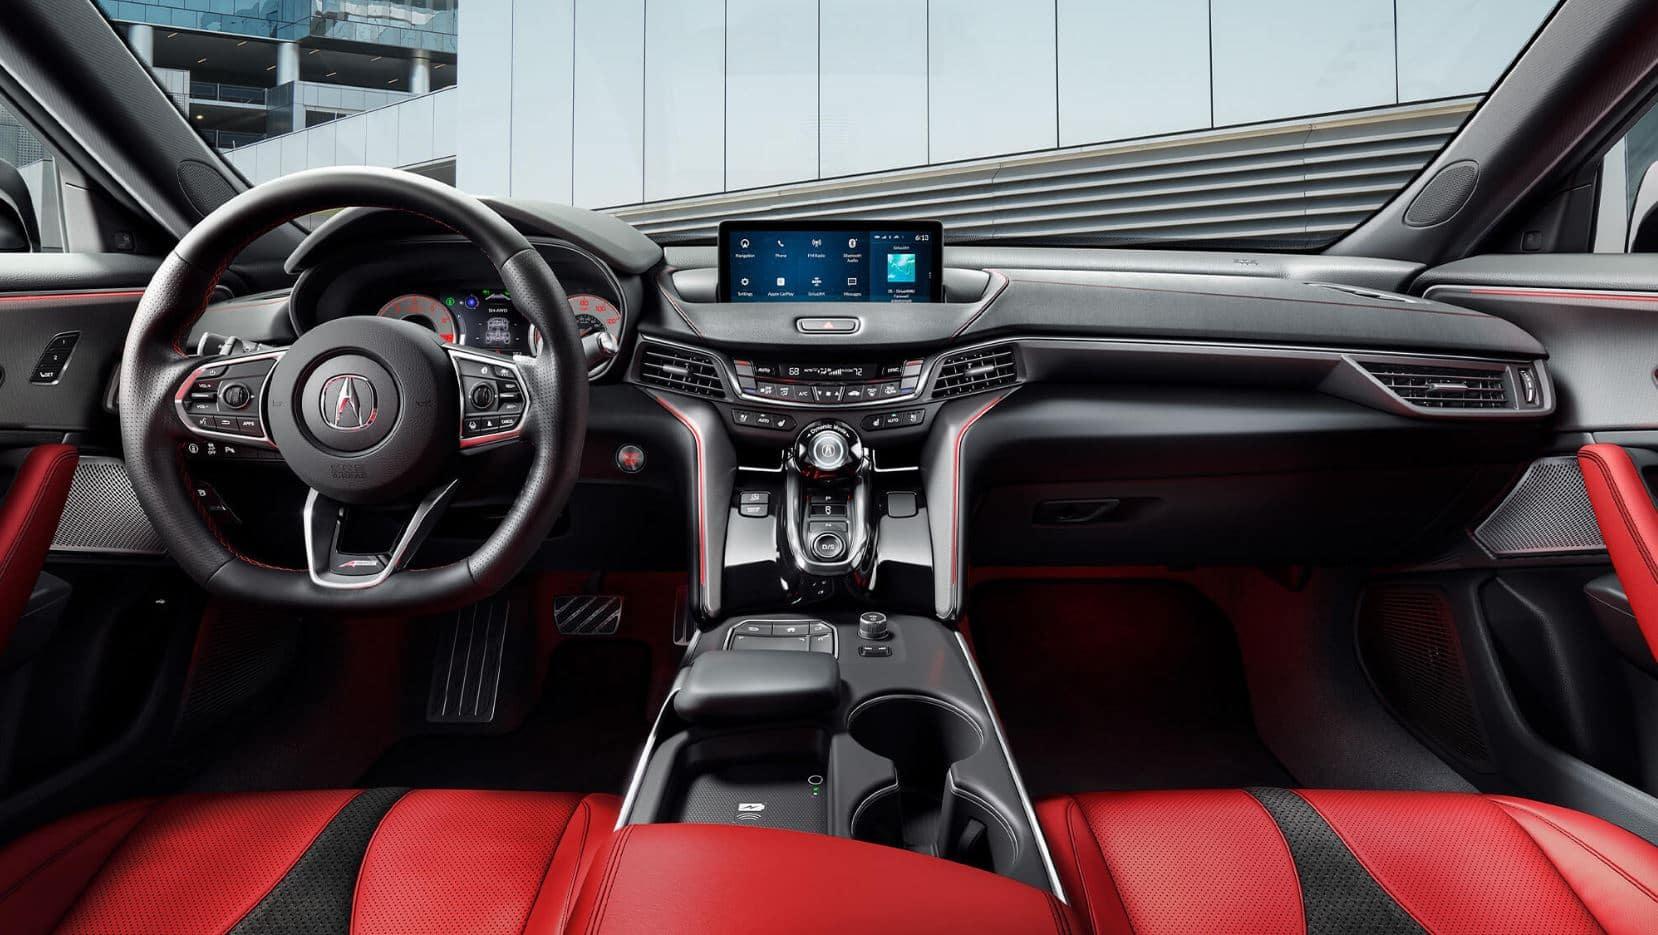 Reserve 2021 Acura TLX in Chamblee, GA